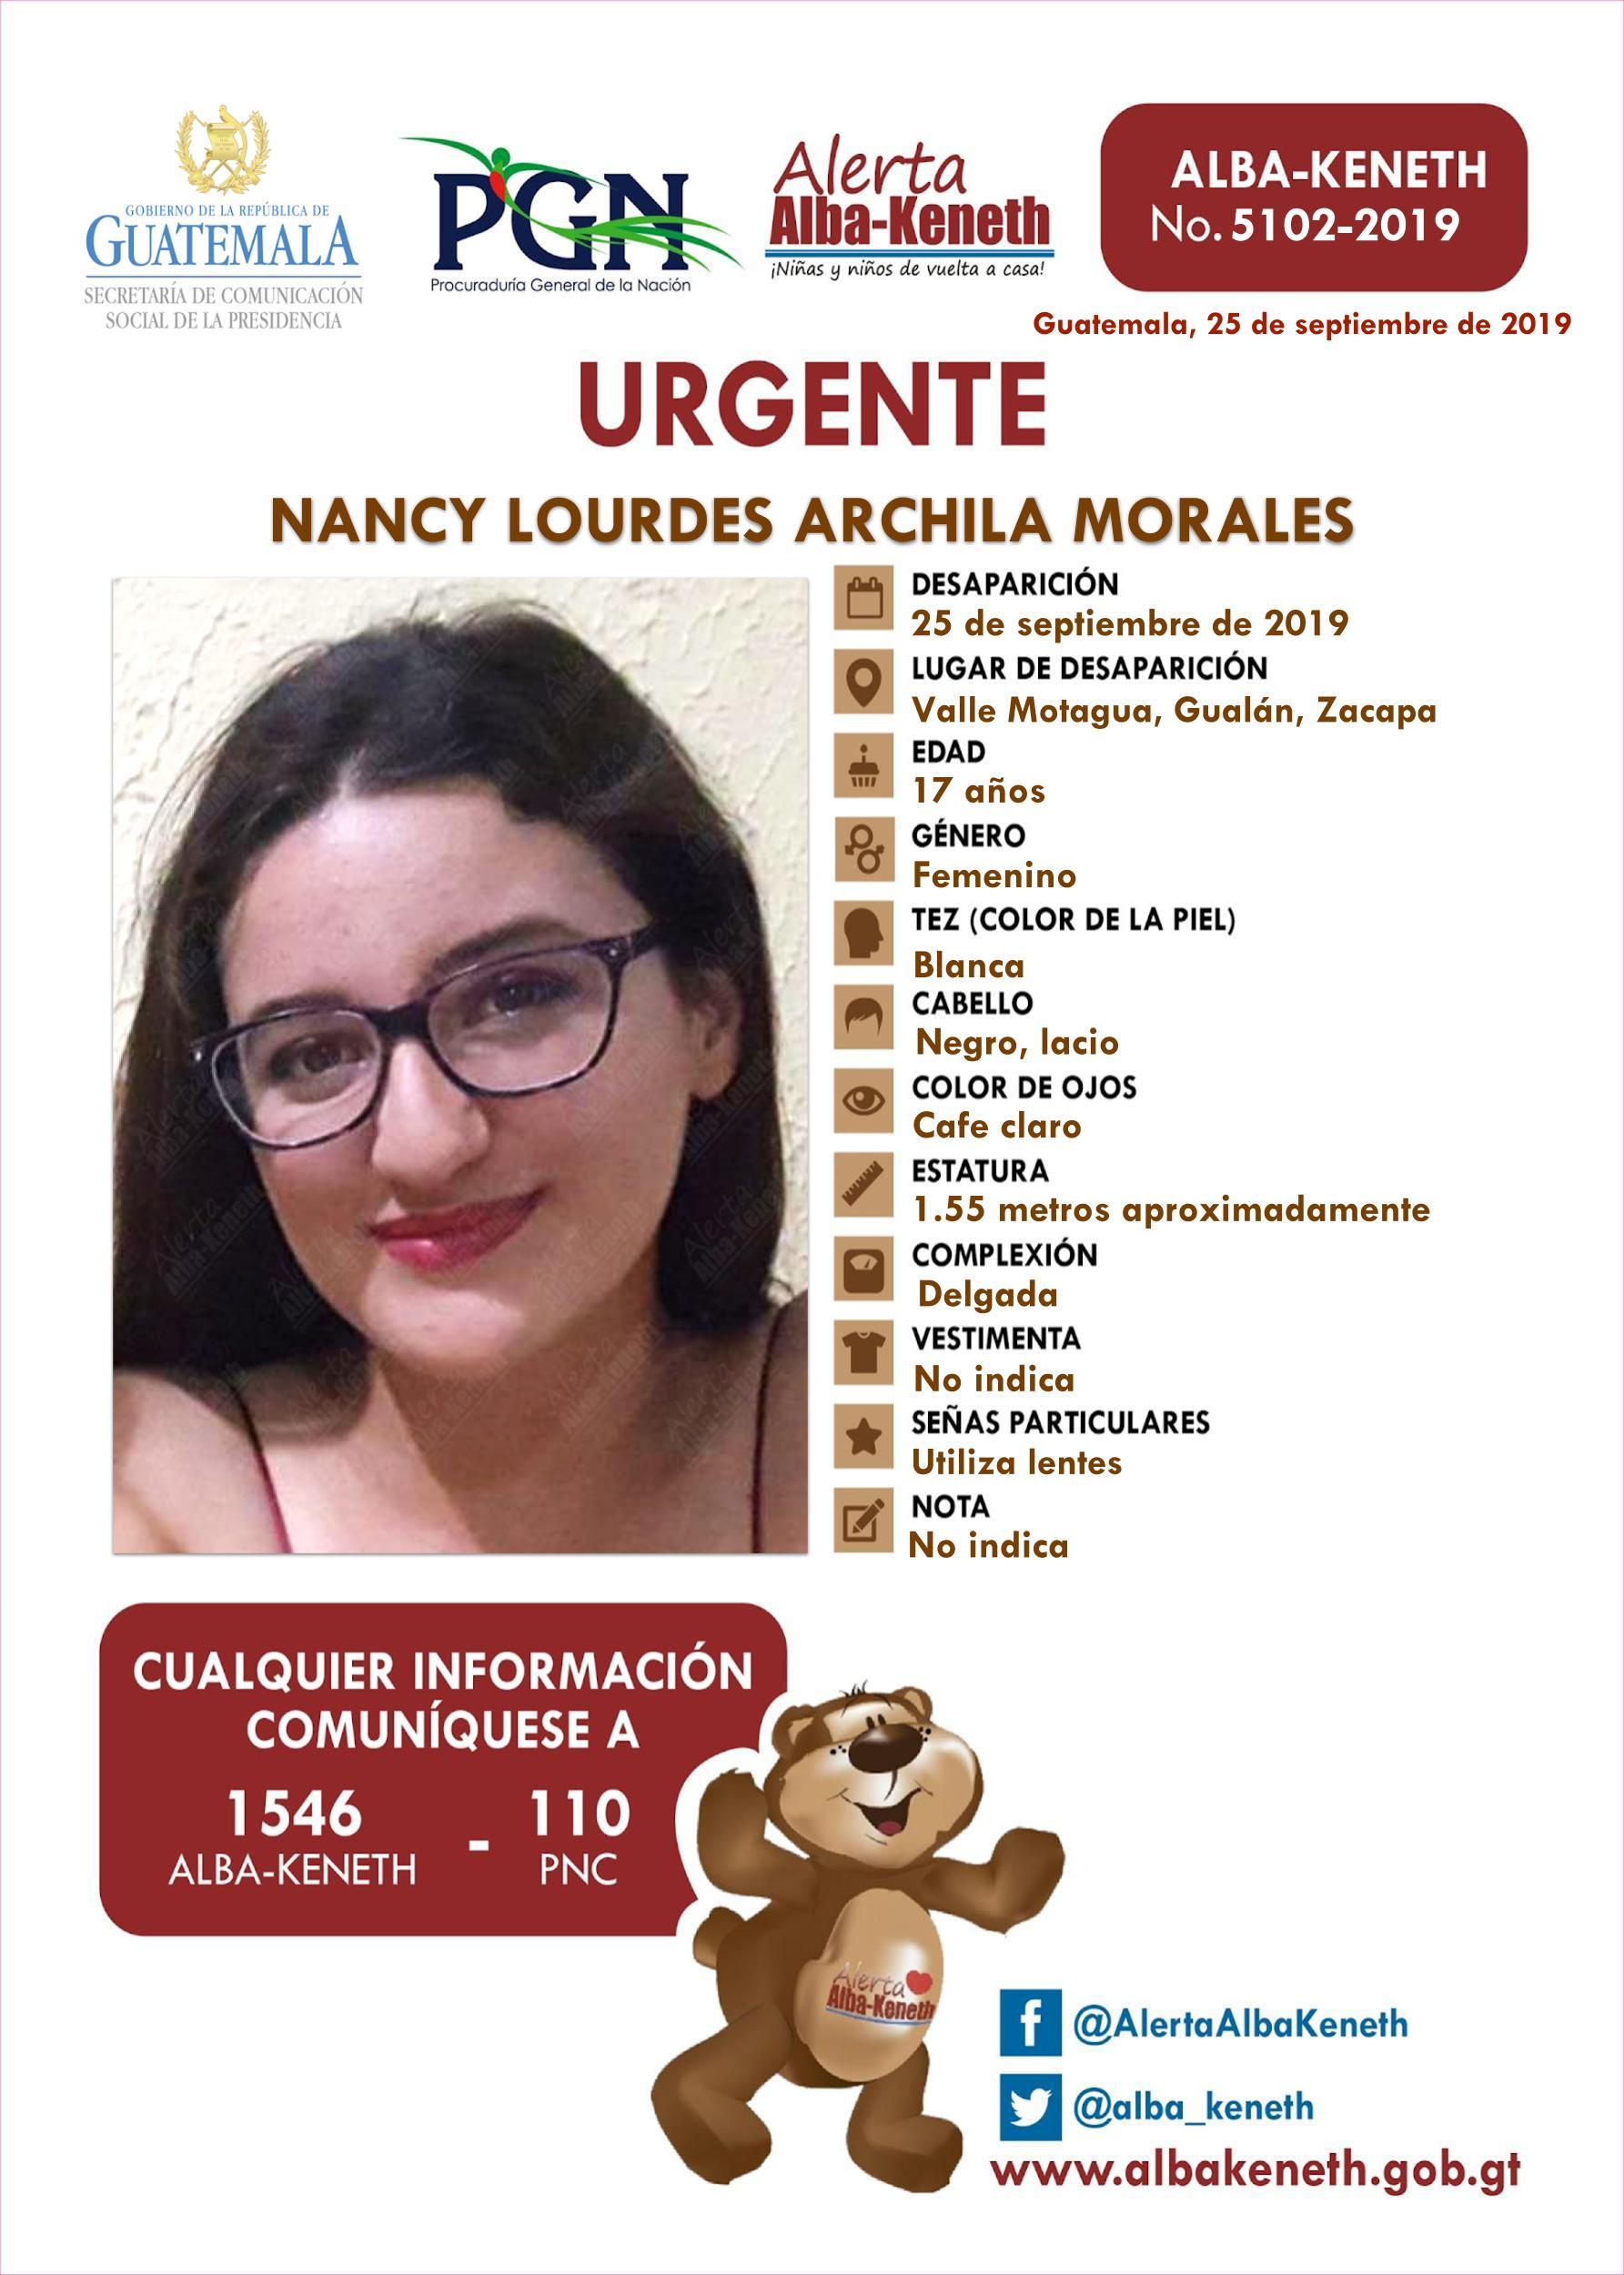 Nancy Lourdes Archila Morales